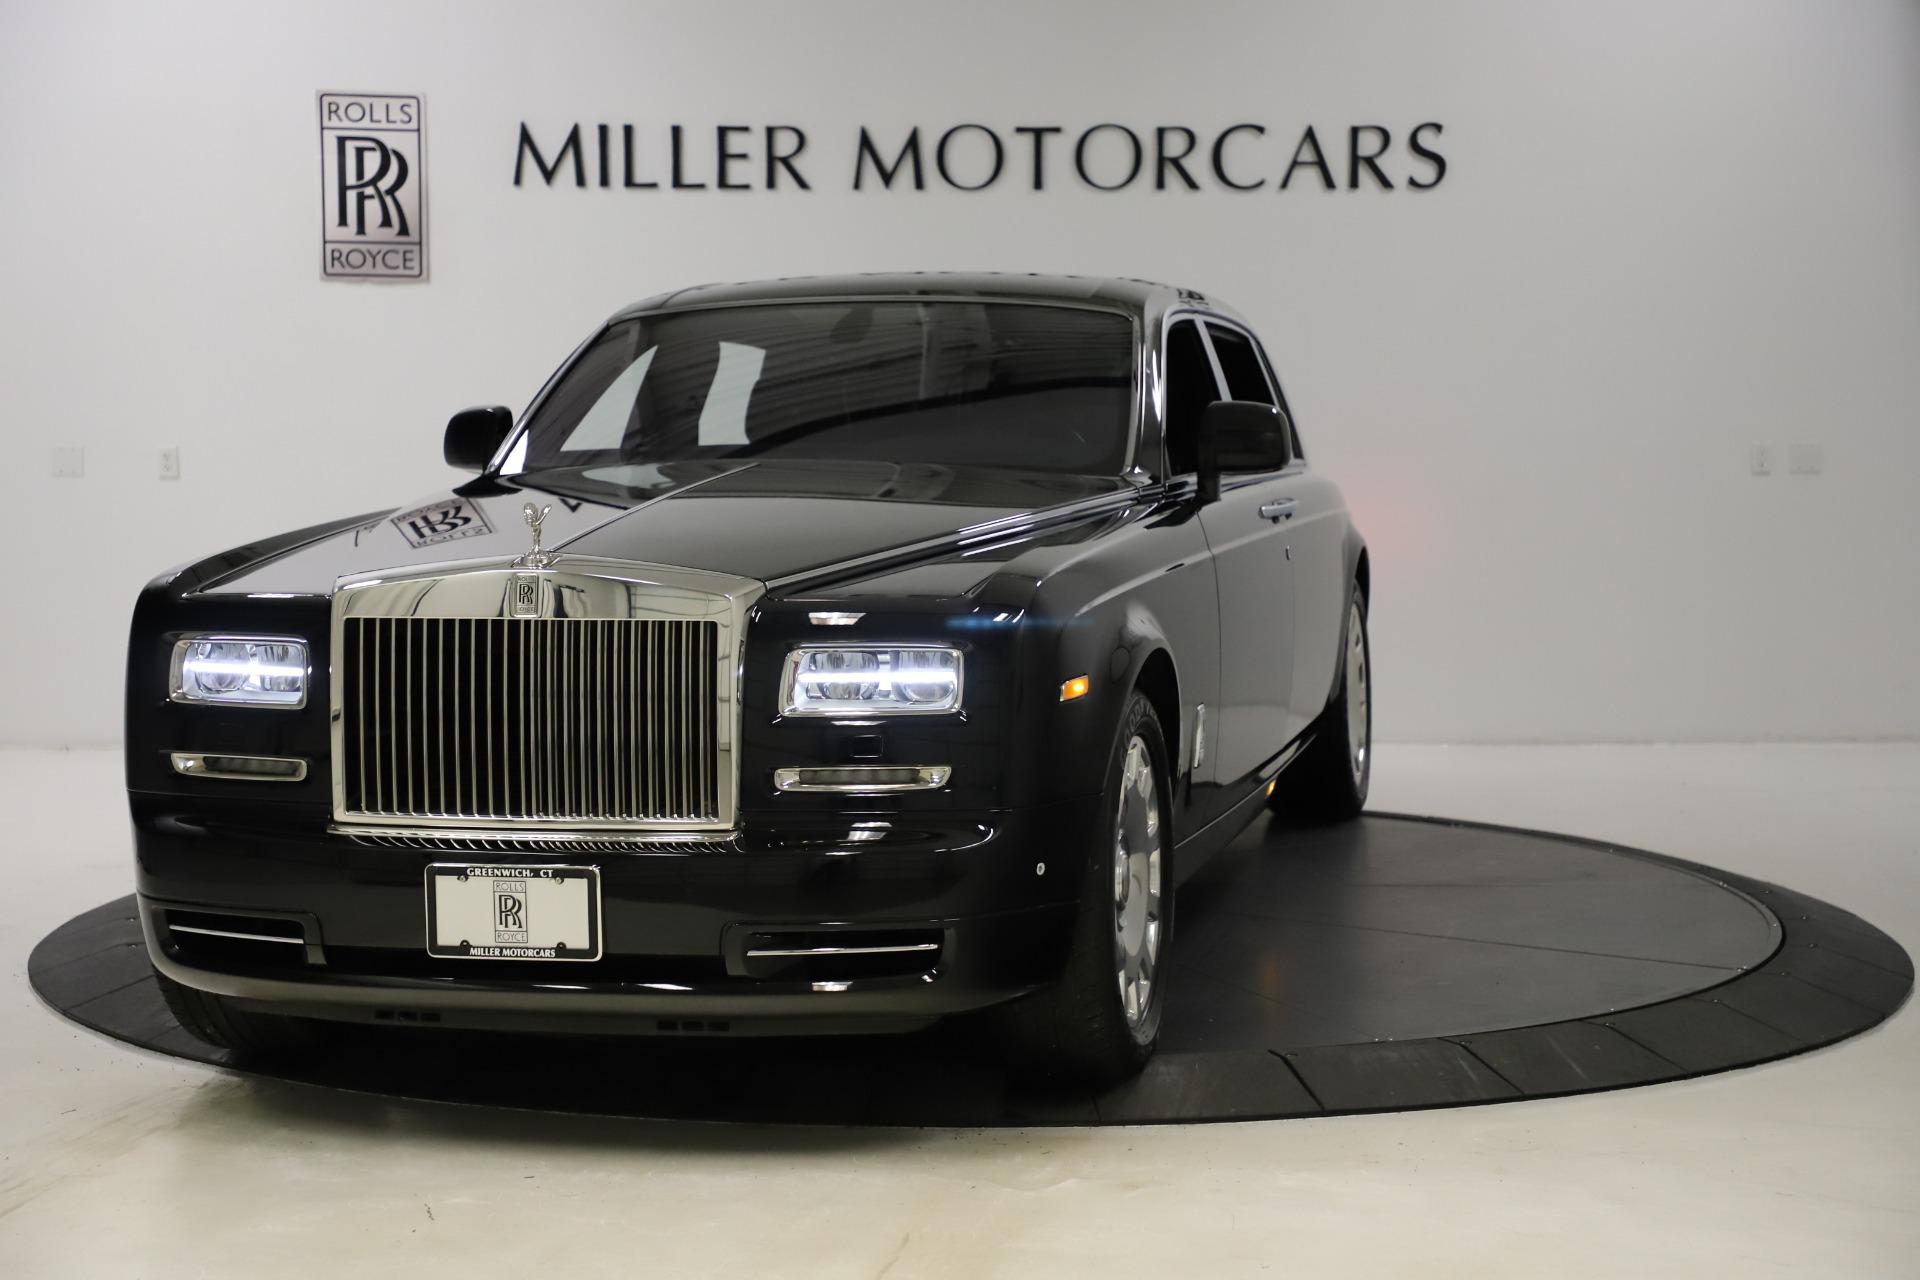 Used 2015 Rolls-Royce Phantom EWB for sale $299,900 at Pagani of Greenwich in Greenwich CT 06830 1